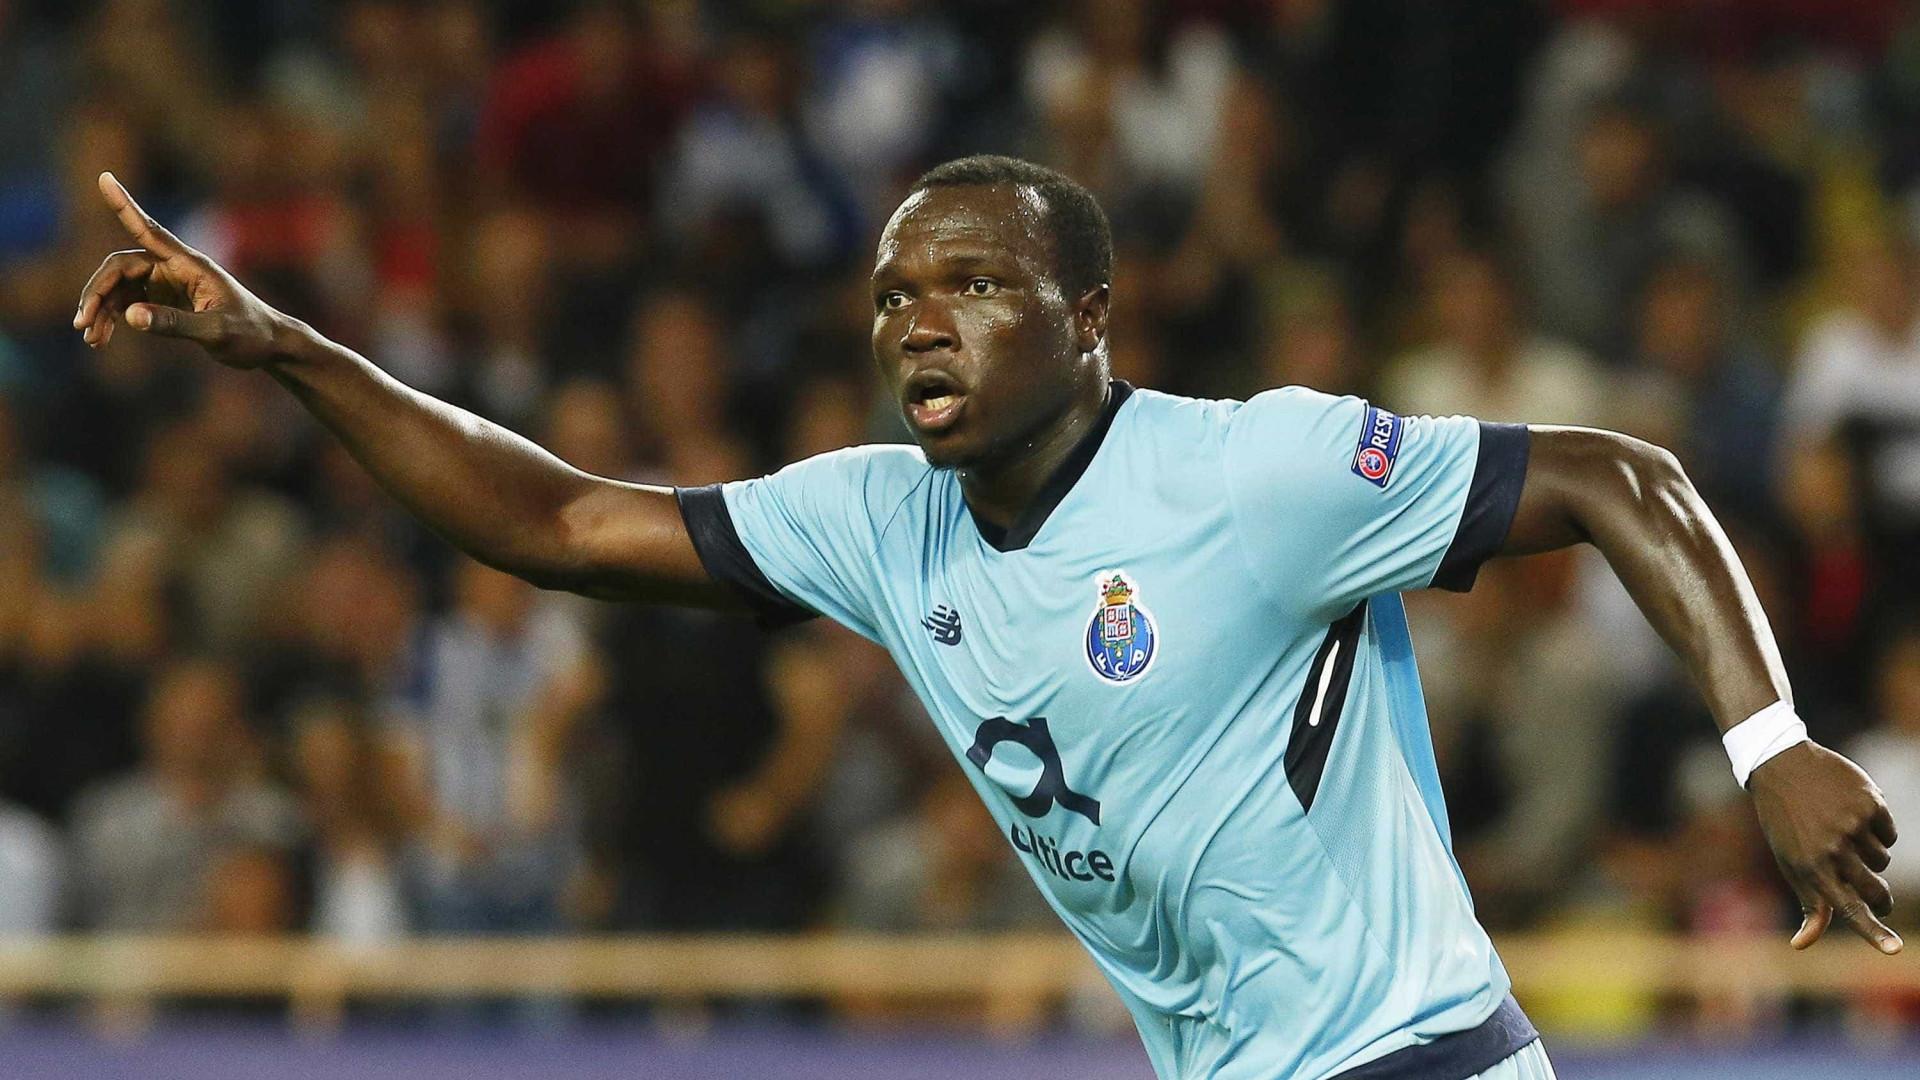 FC Porto compra totalidade do passe de Aboubakar e renova até 2021